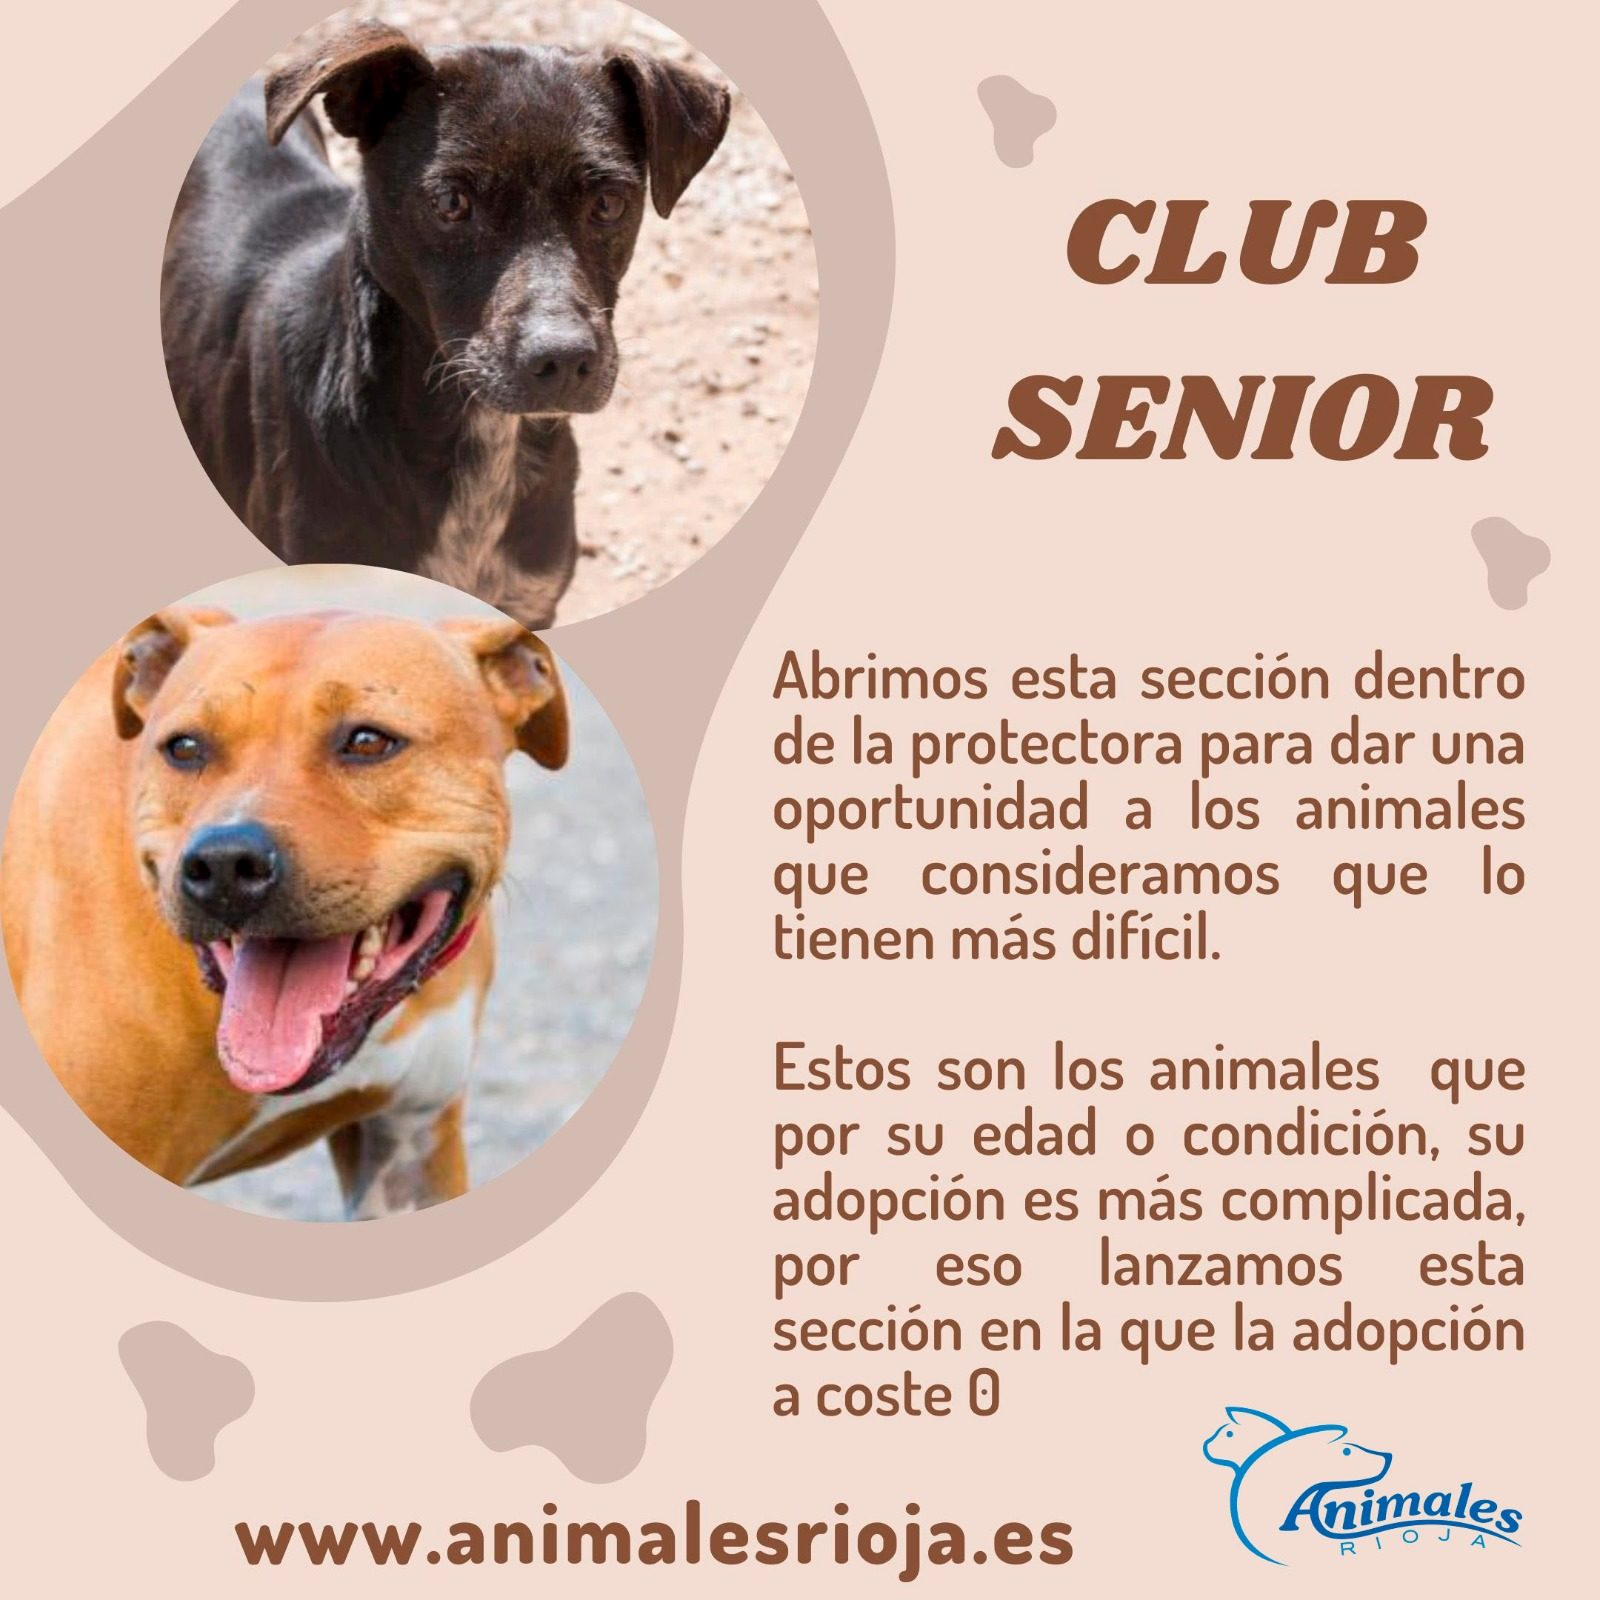 Club Senior